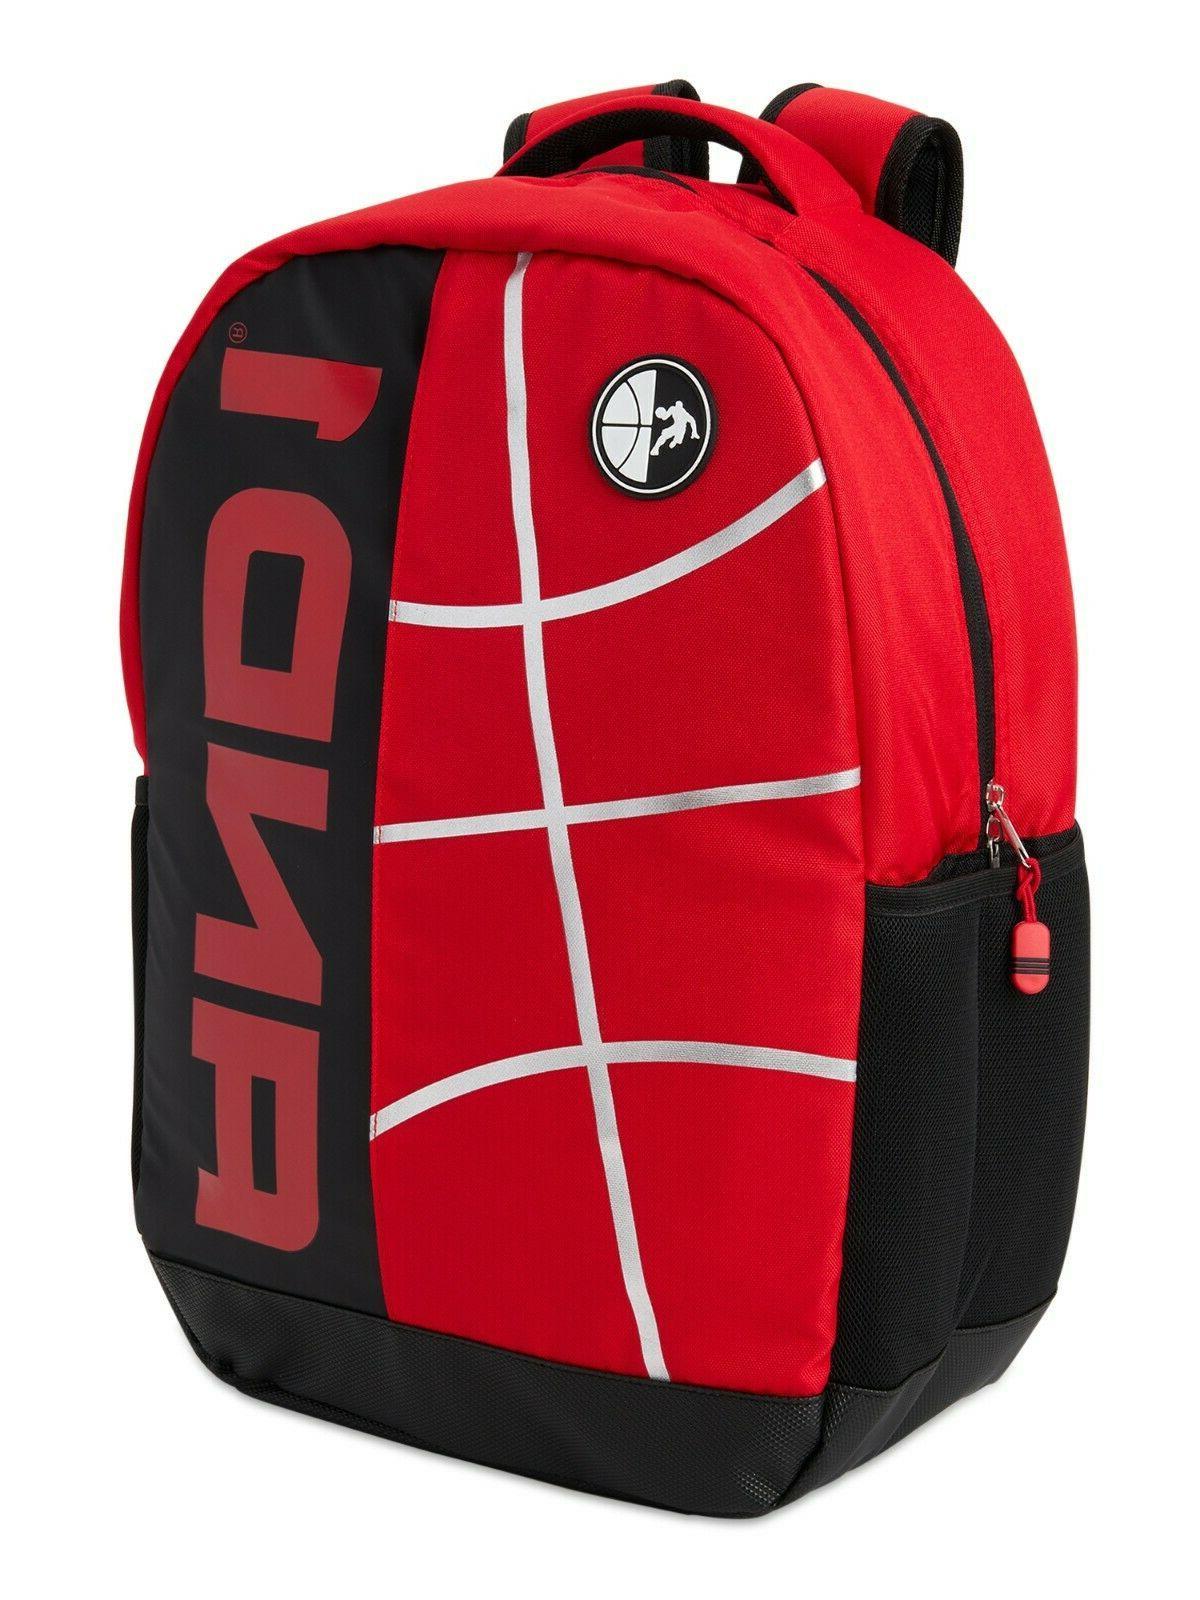 "18"" Paint"" Black Red Backpack/Book Bag Laptop"